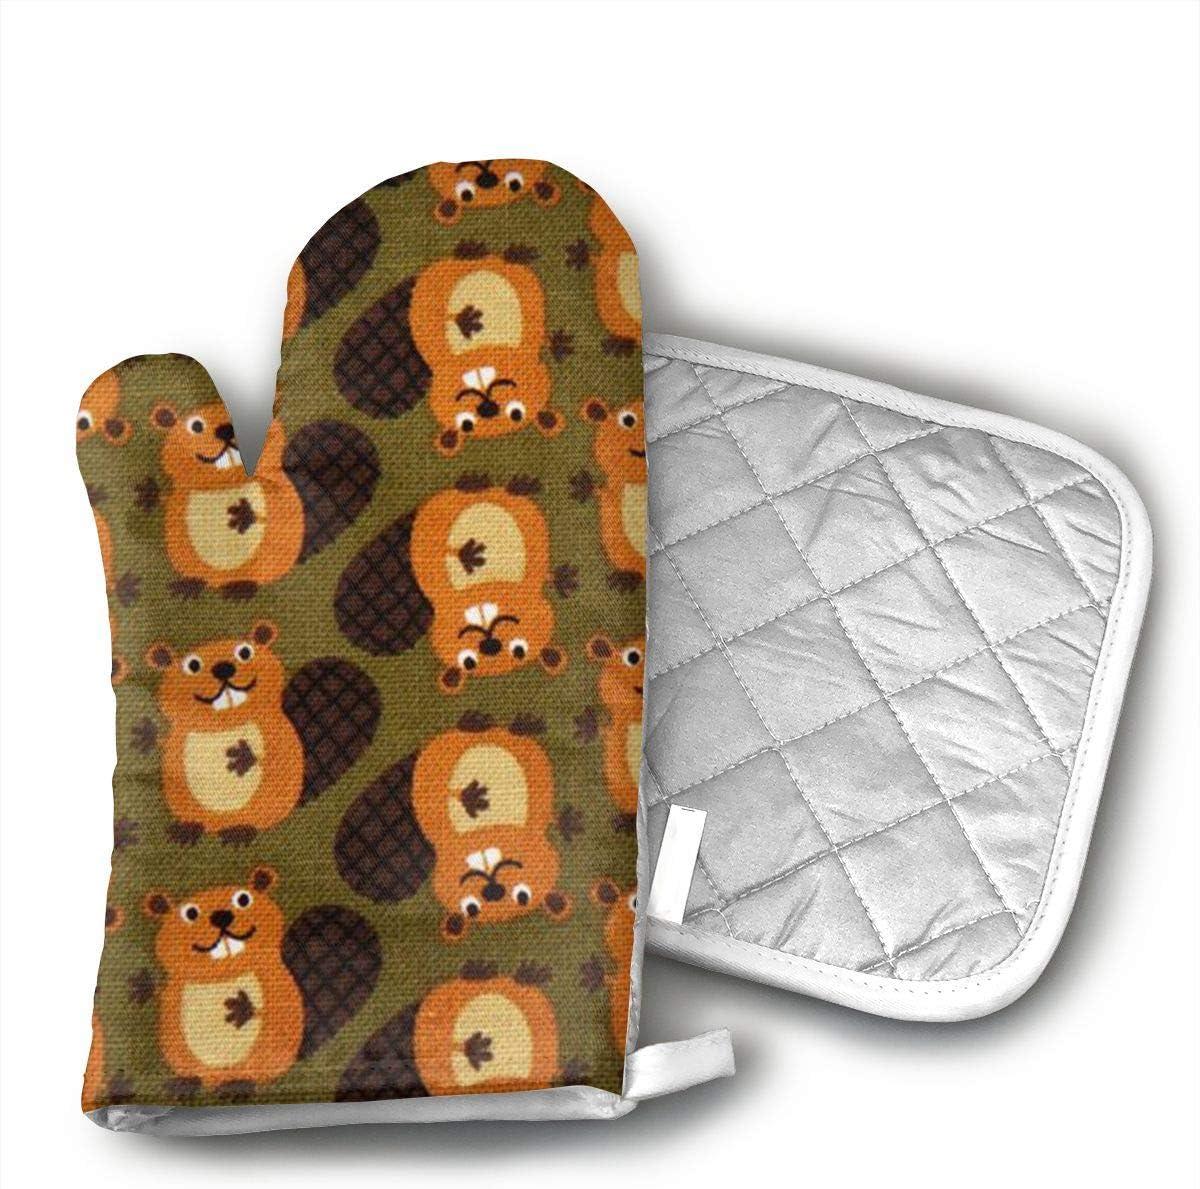 Beaver Oven Mitts Heat Resistant Kitchen Gloves and Potholders BBQ Gloves-Cotton Pot Holders Non Slip Oven Gloves for Kitchen